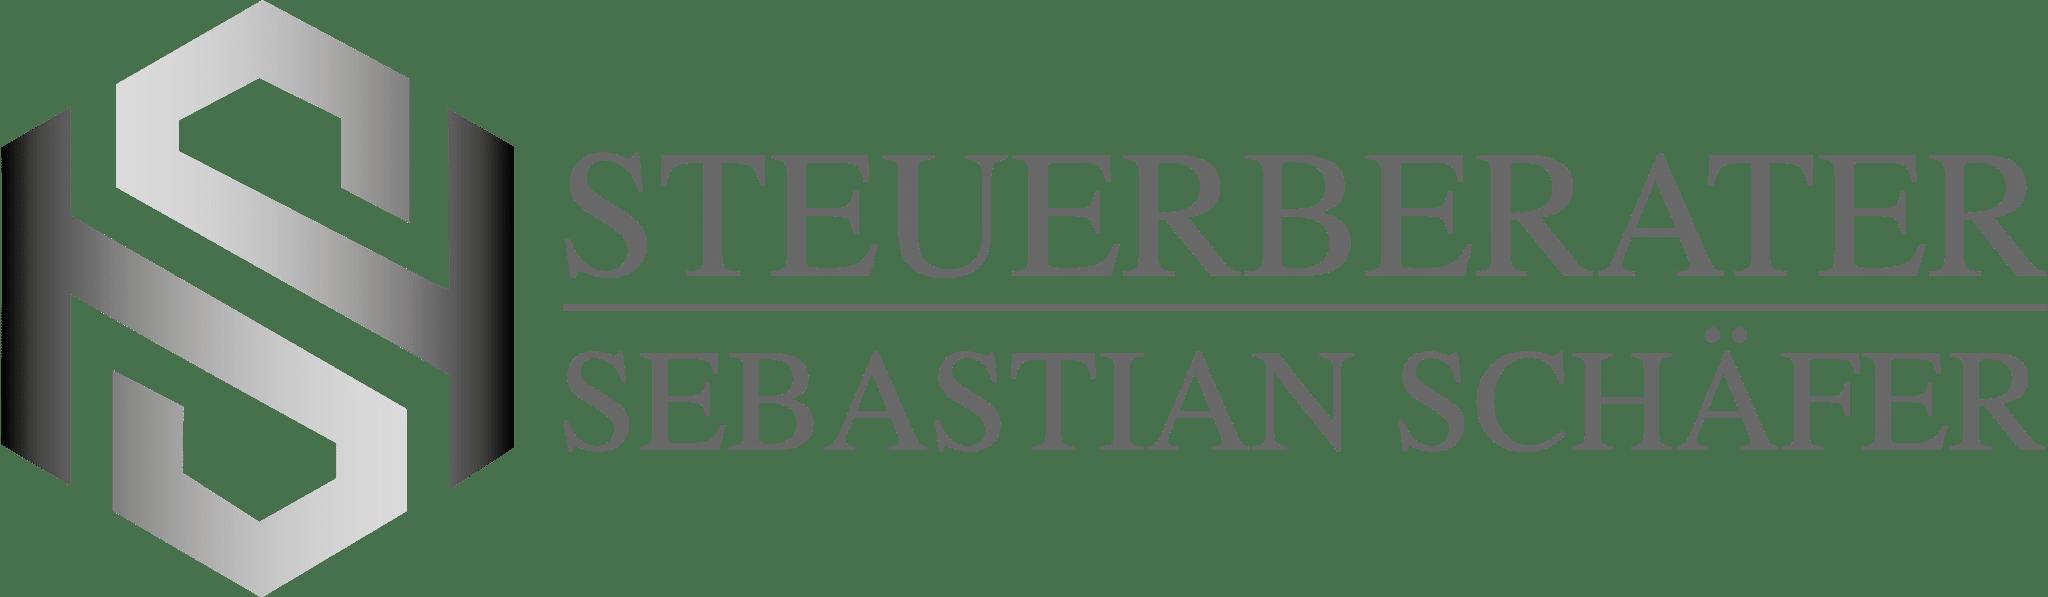 Steuerberater Babenhausen Logo